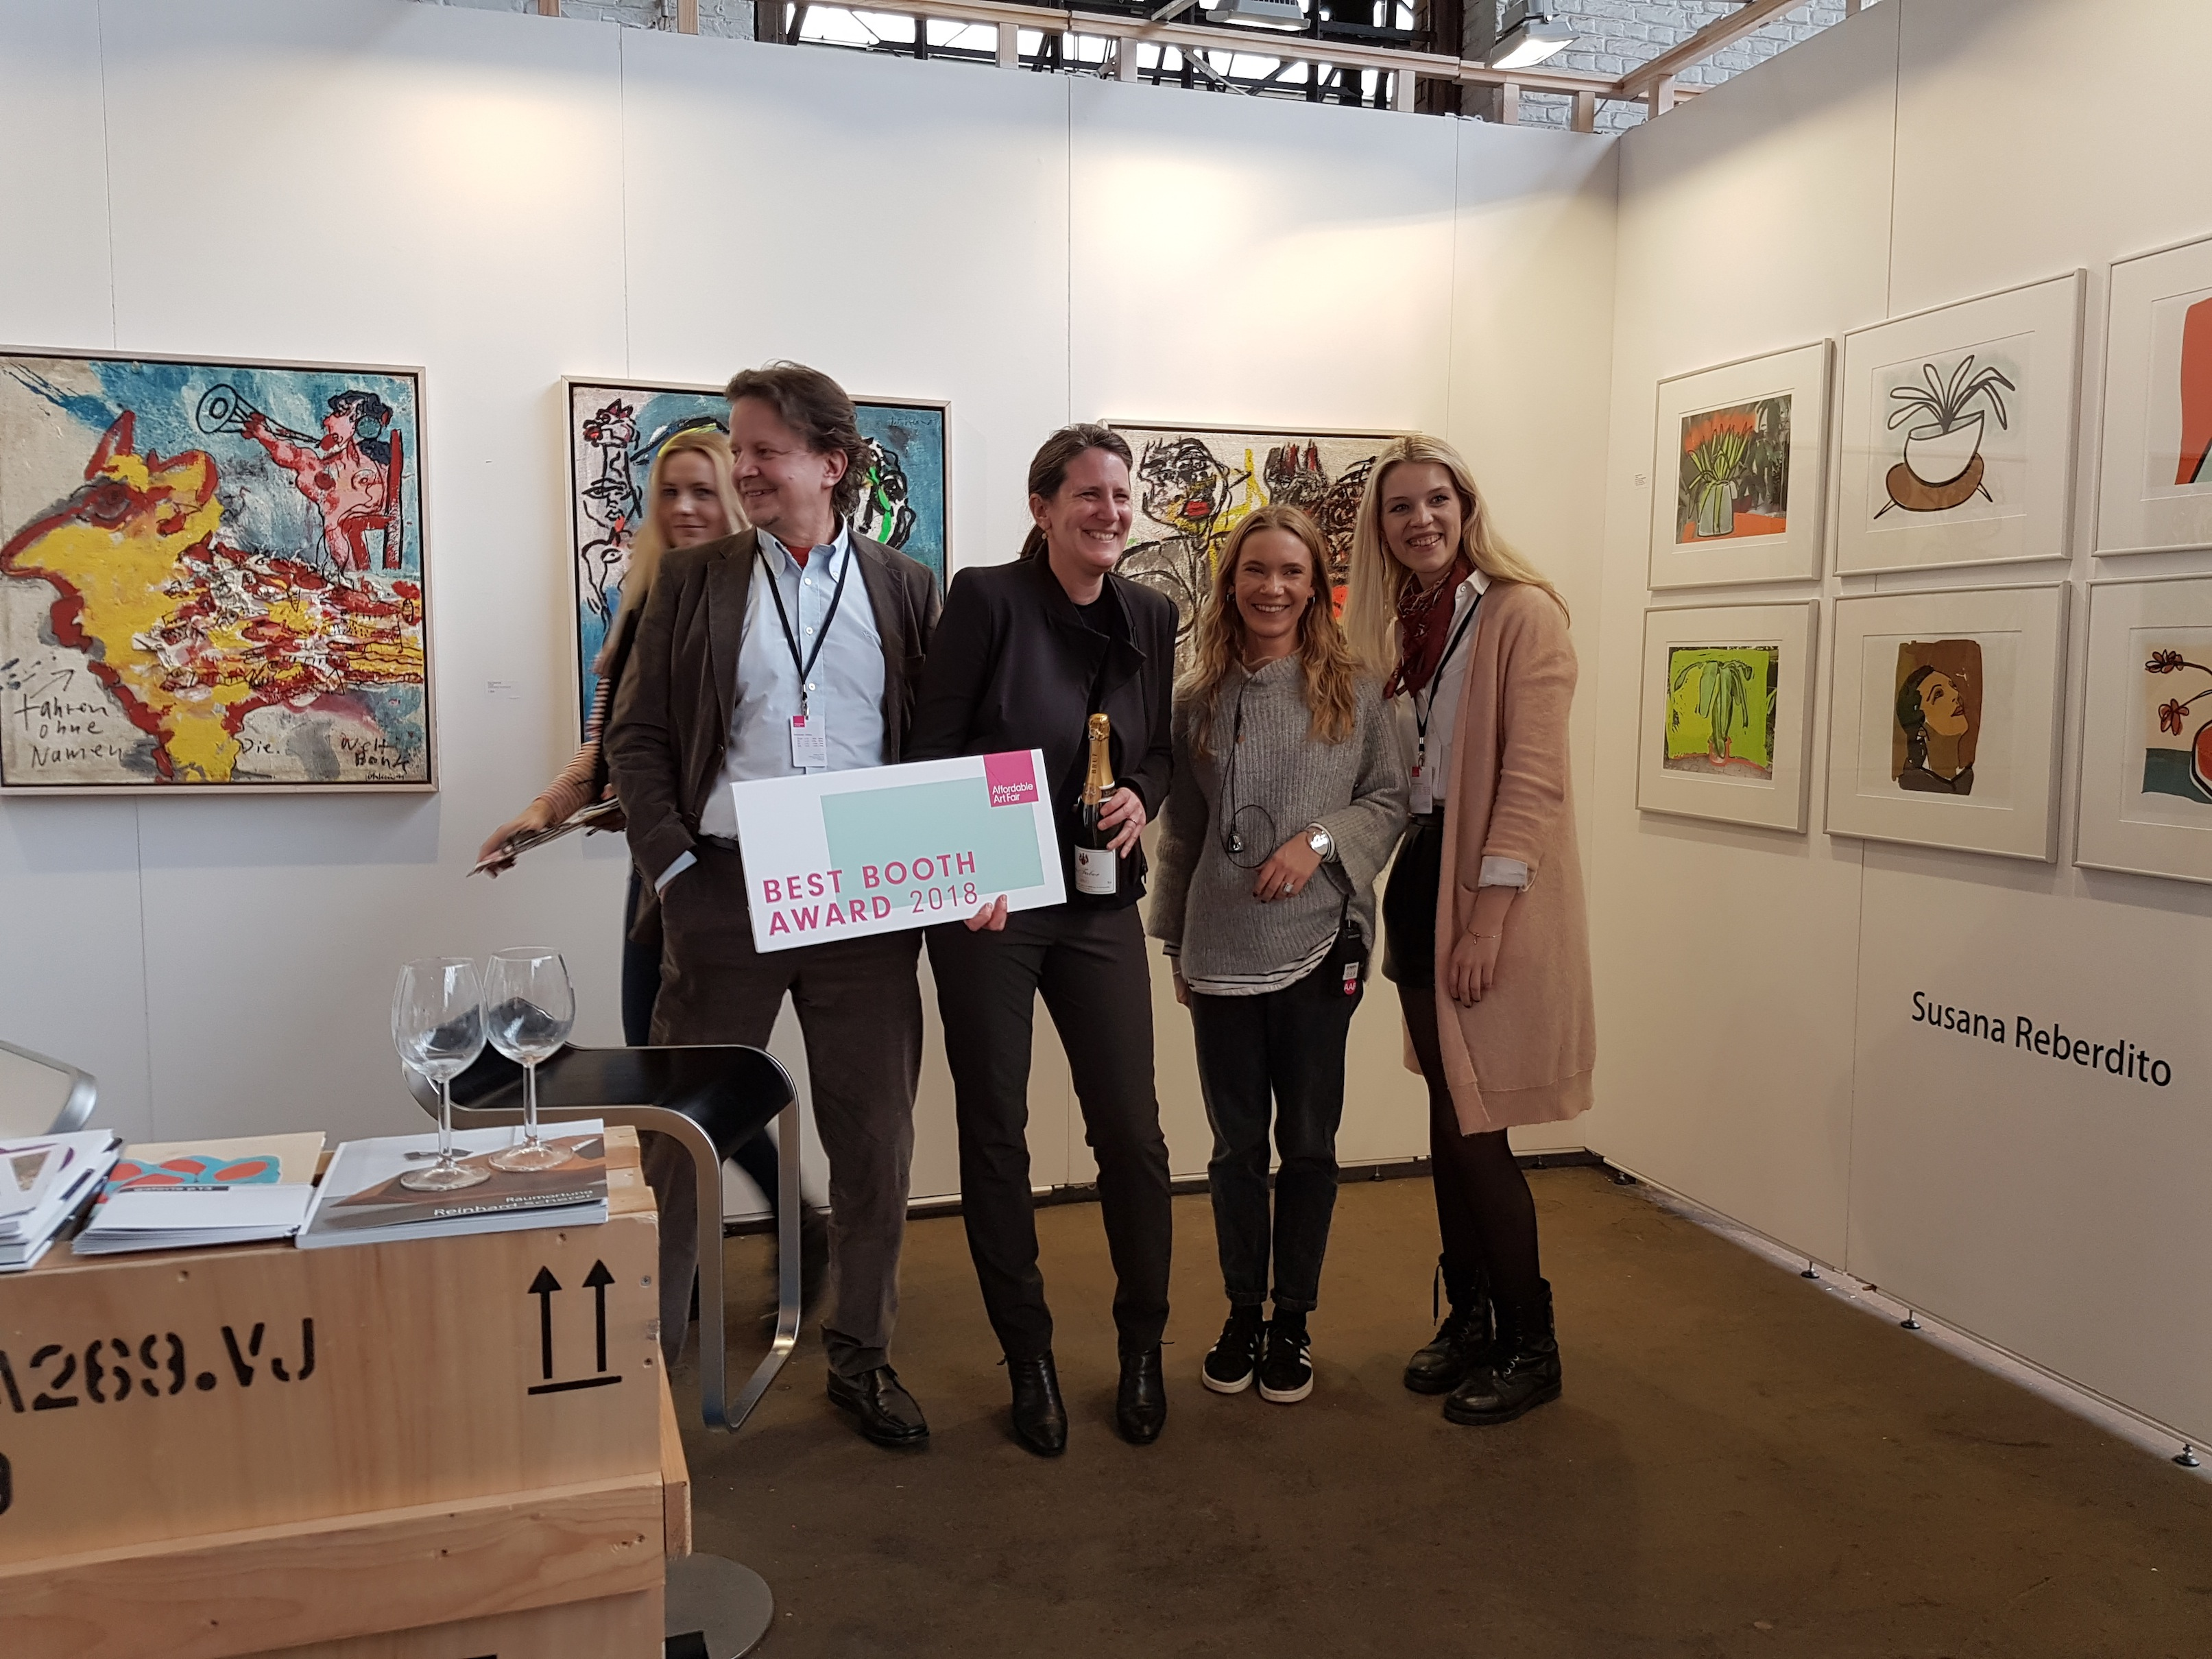 Bester Stand auf der Affordable Art Brussels 2018